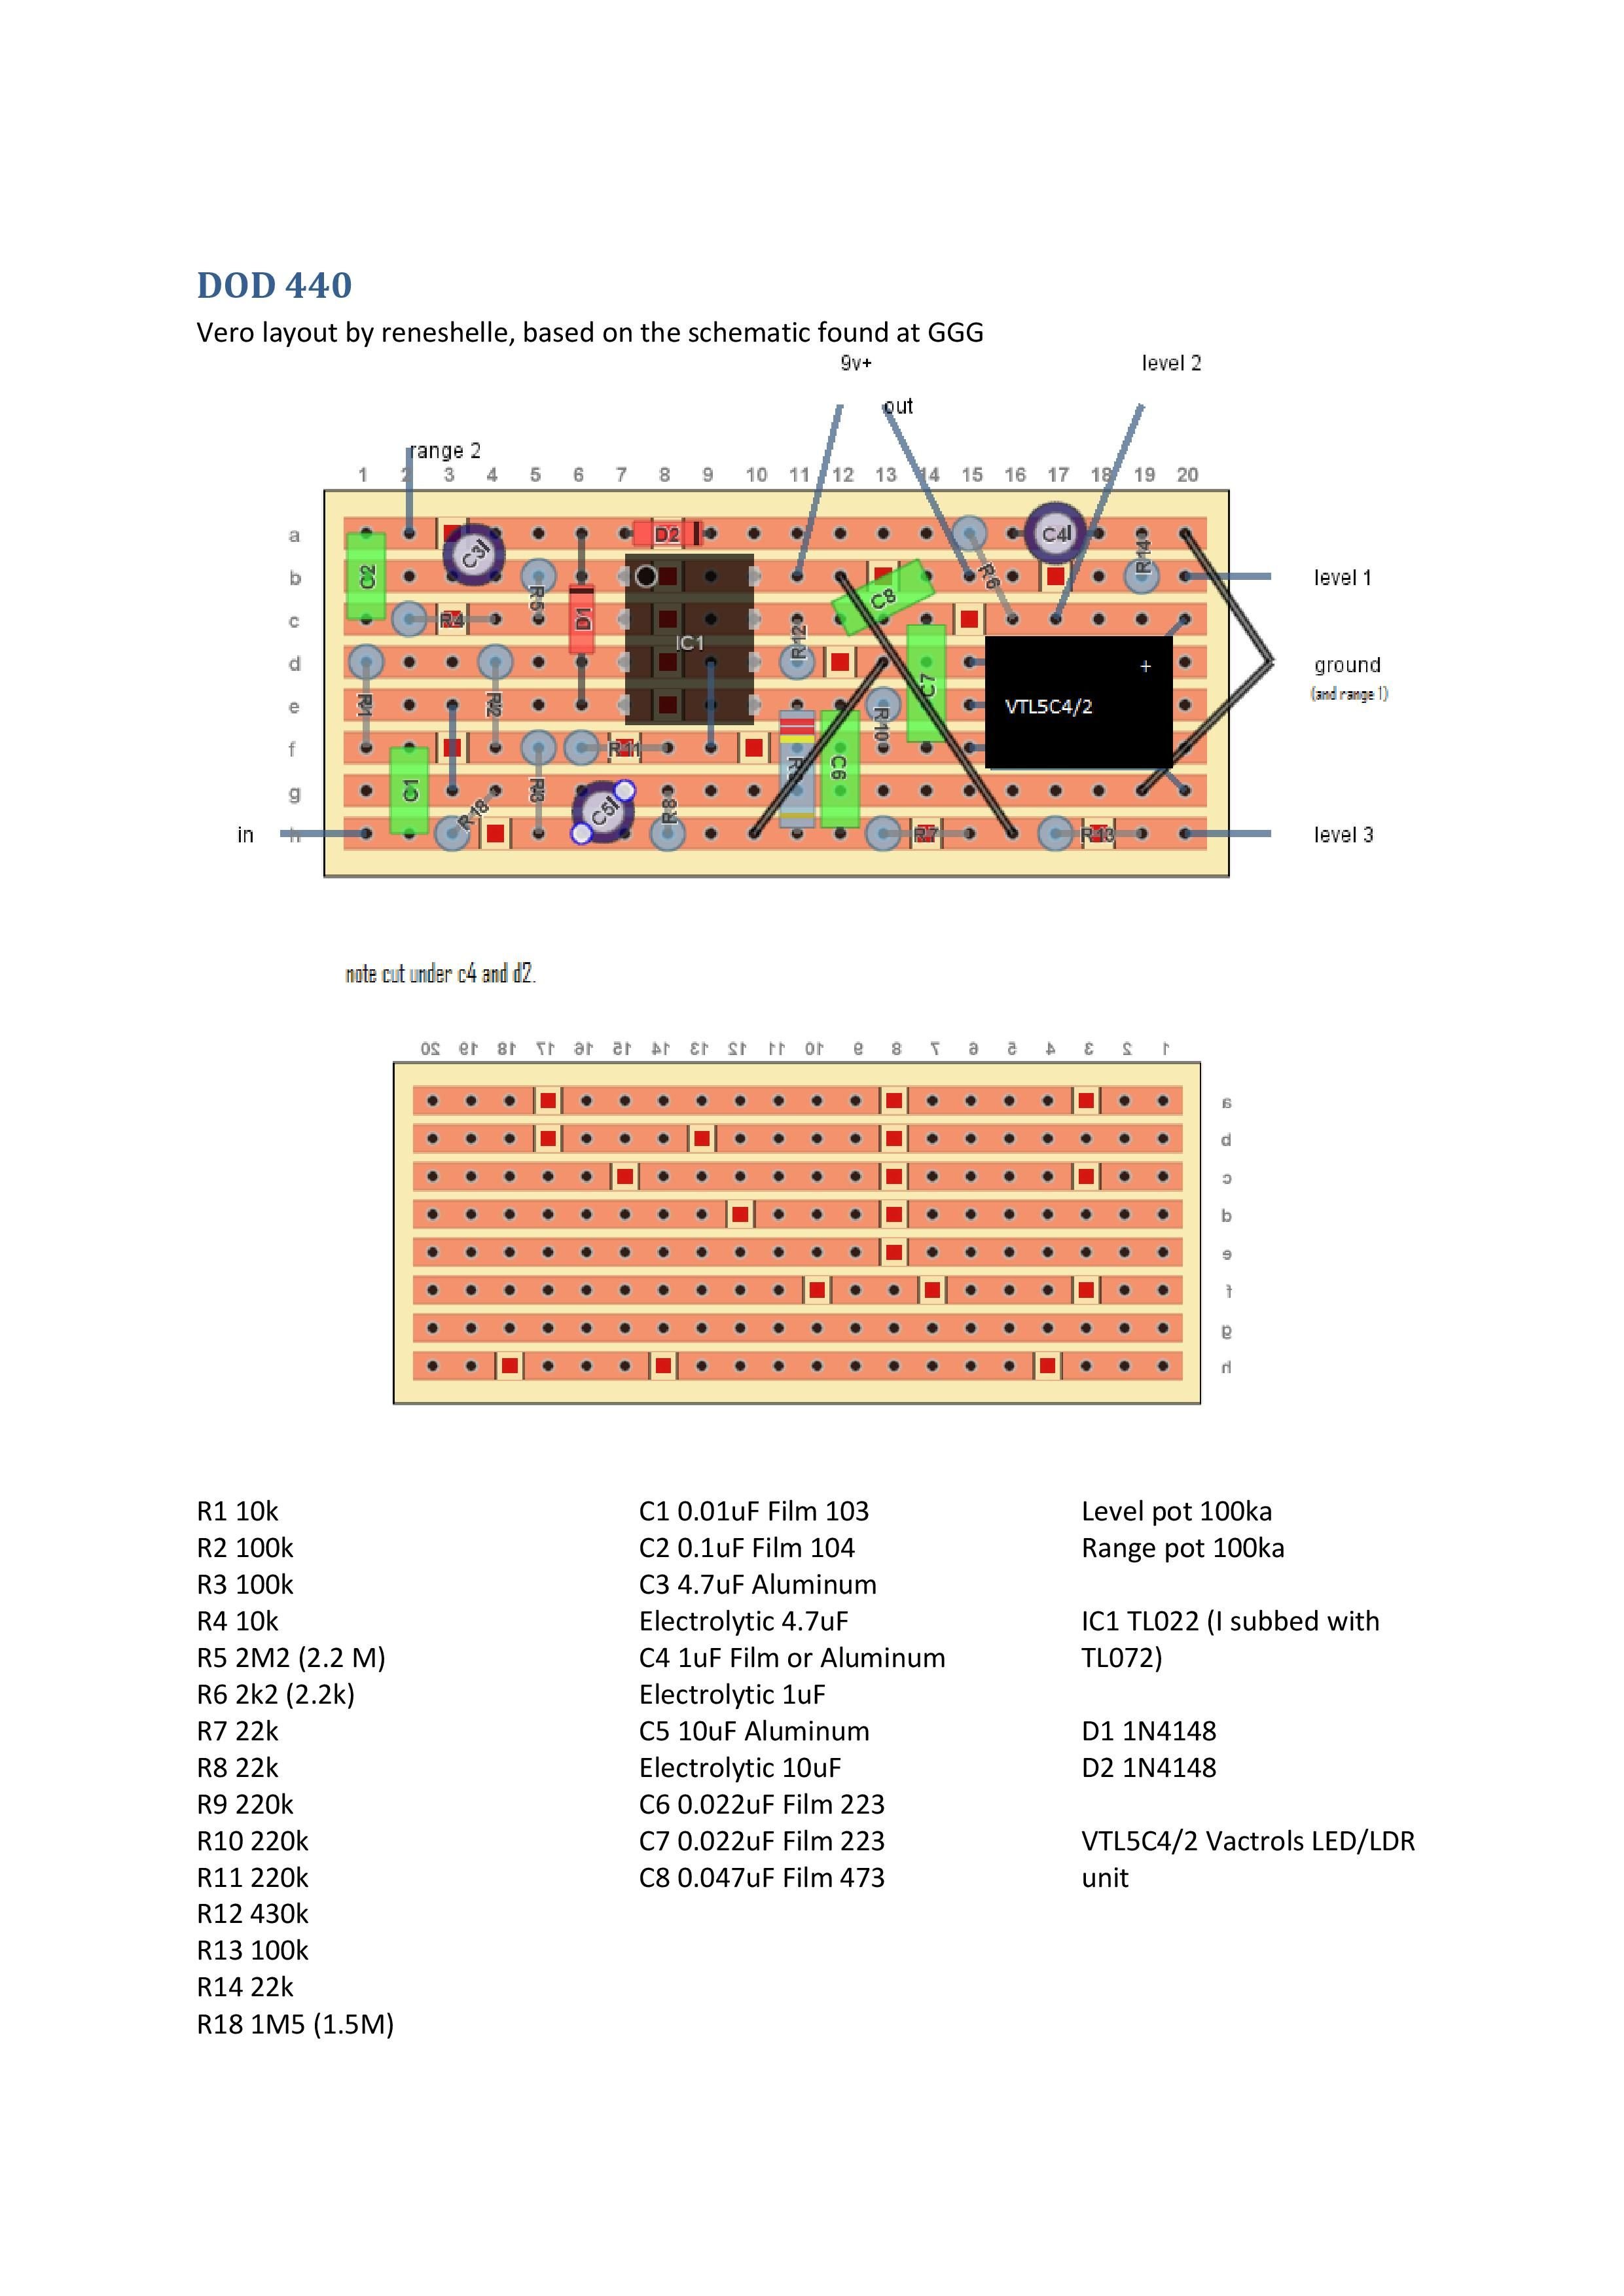 827d3bcab335fb343ce480993eb091cb Envelope Filter Schematic on reverb schematic, eq schematic, mutron 3 schematic, preamp schematic, generator schematic, wah schematic, pitch shifter schematic, phaser schematic, limiter schematic, mixer schematic, vibrato schematic, ring modulator schematic, distortion schematic, compressor schematic, expression pedal schematic, chorus schematic, univibe schematic, buffer schematic, q-tron schematic,